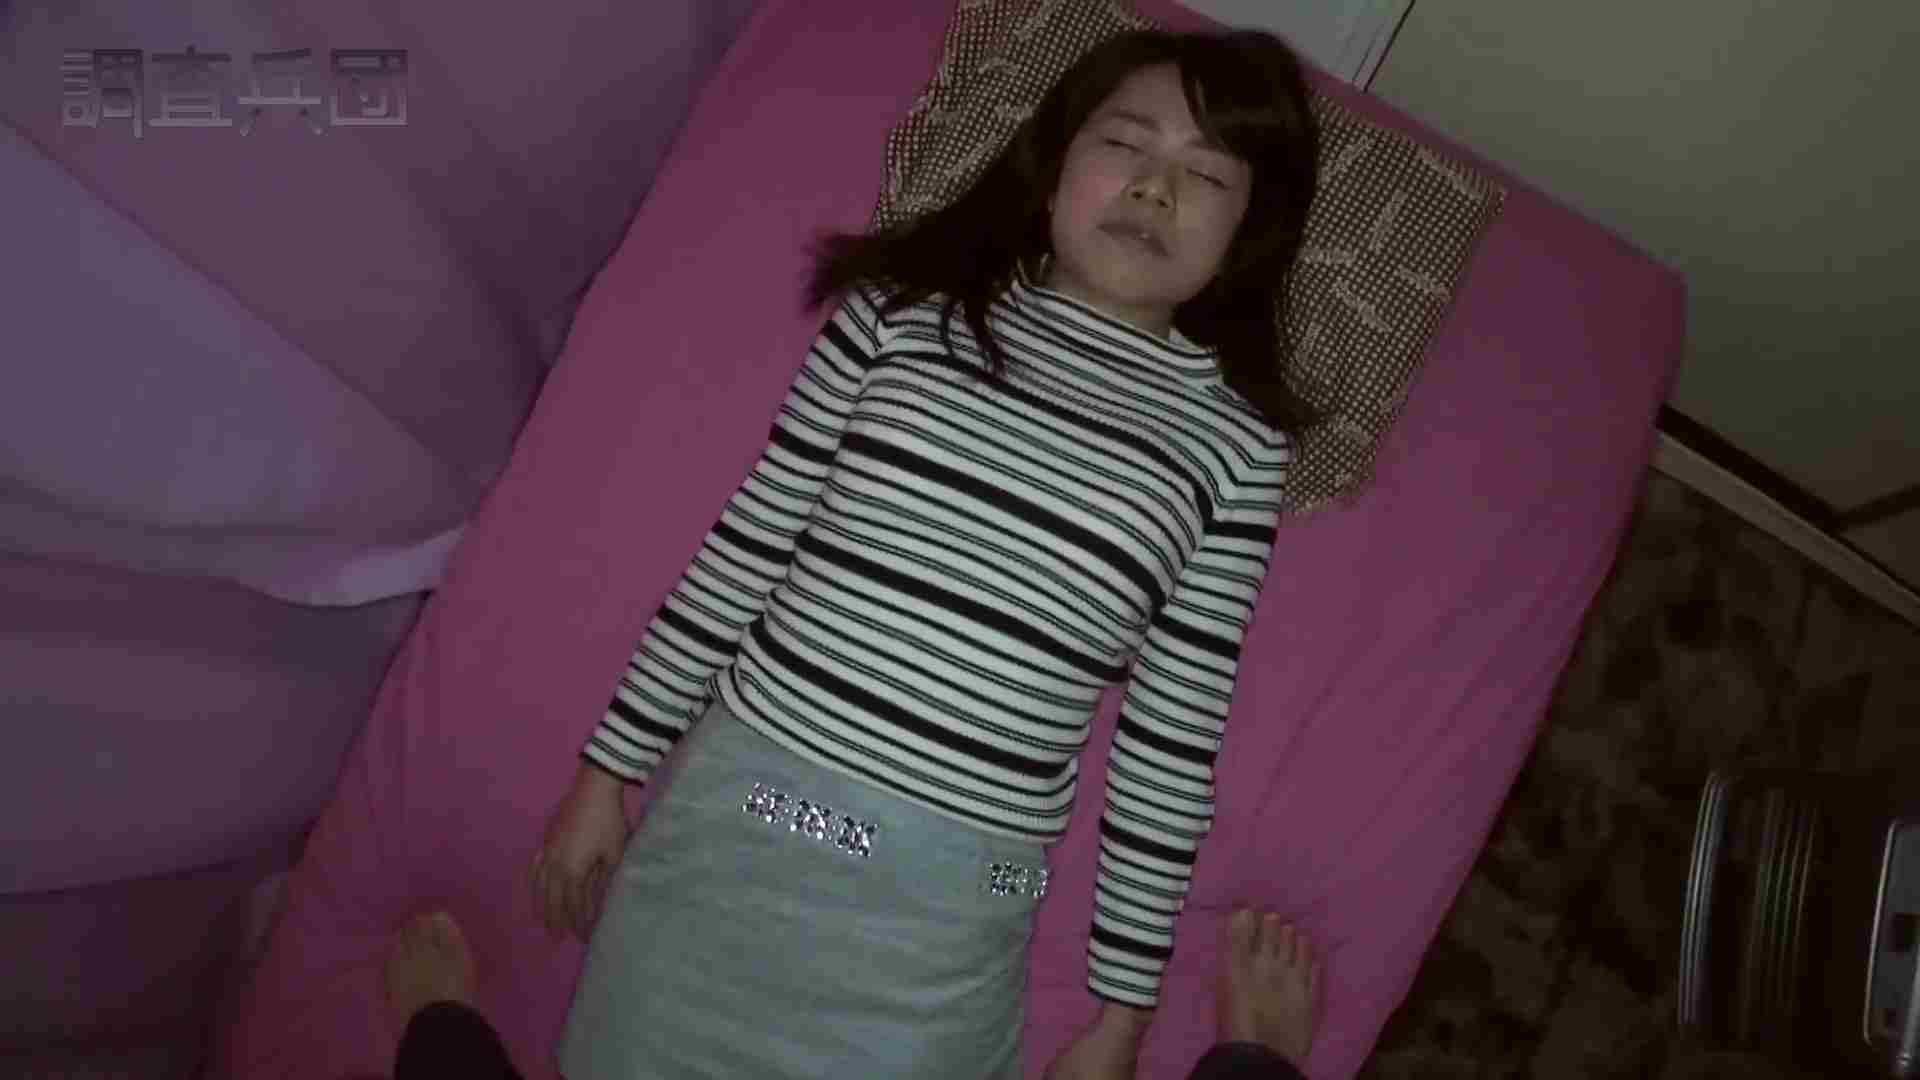 RE:~反撃の悪戯~vol.9 帰国子女の才女・みほ【前編】 OLの実態 | 反撃の悪戯  64pic 1